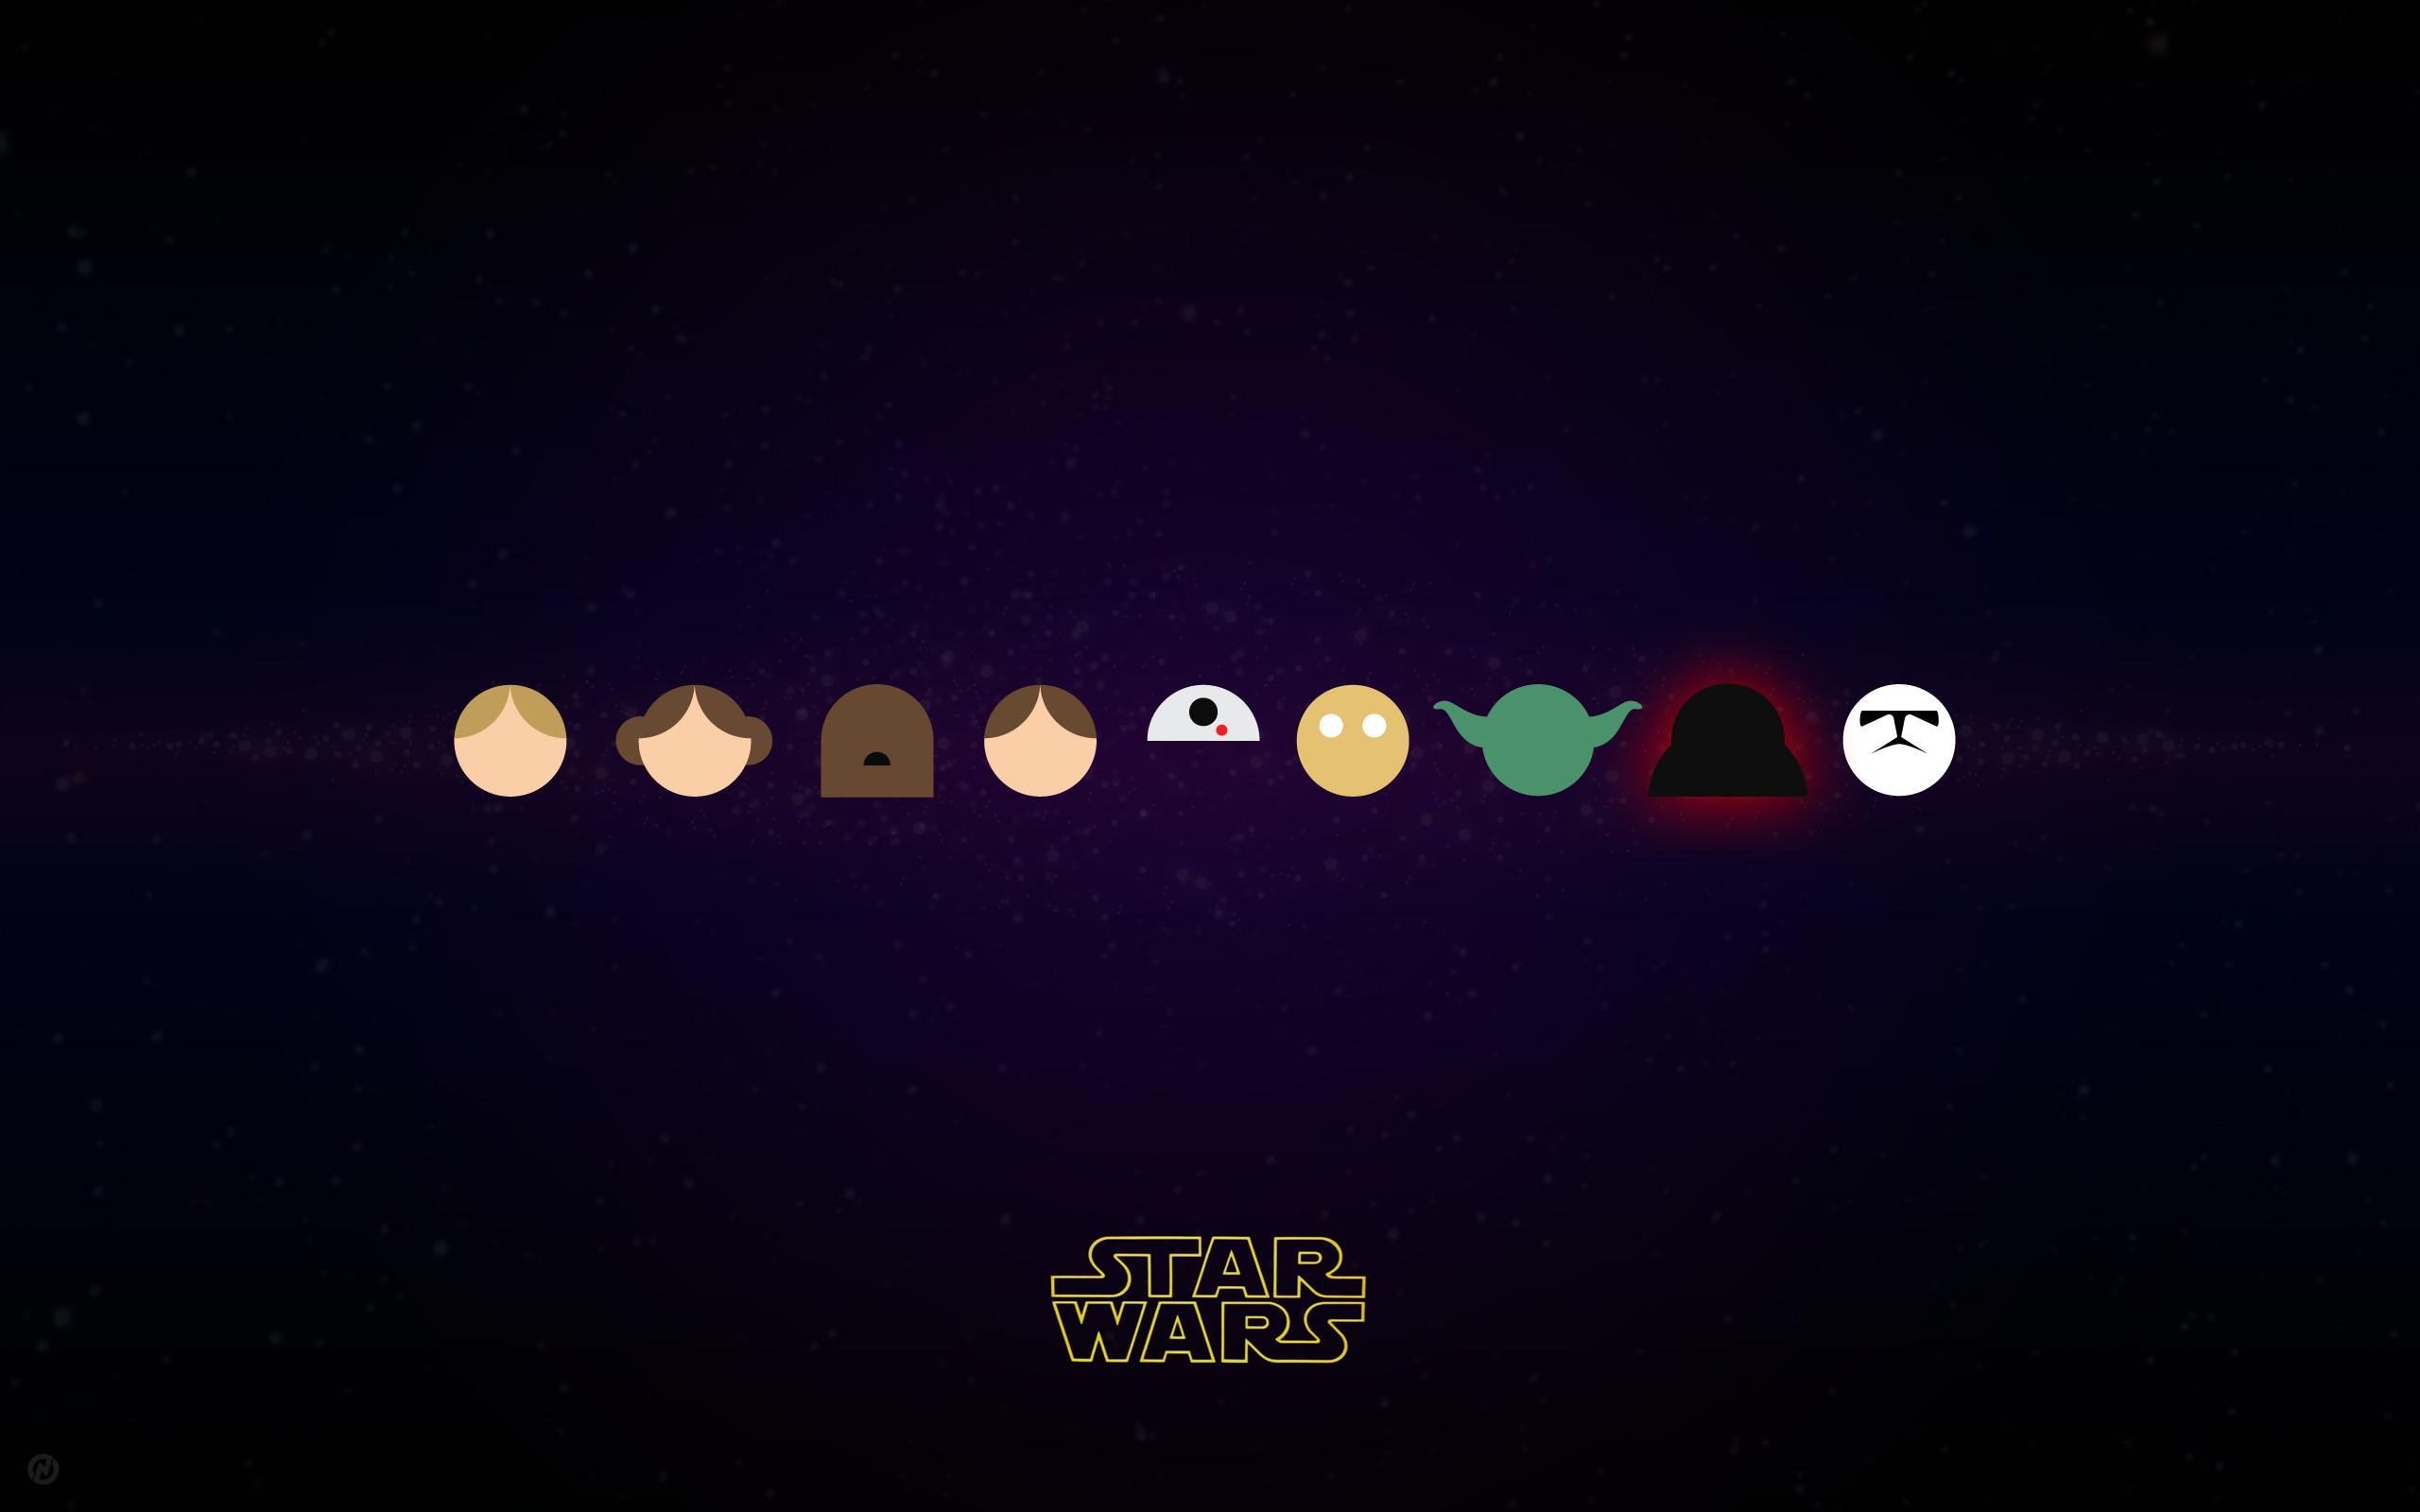 star wars logo wallpaper (67+ images)